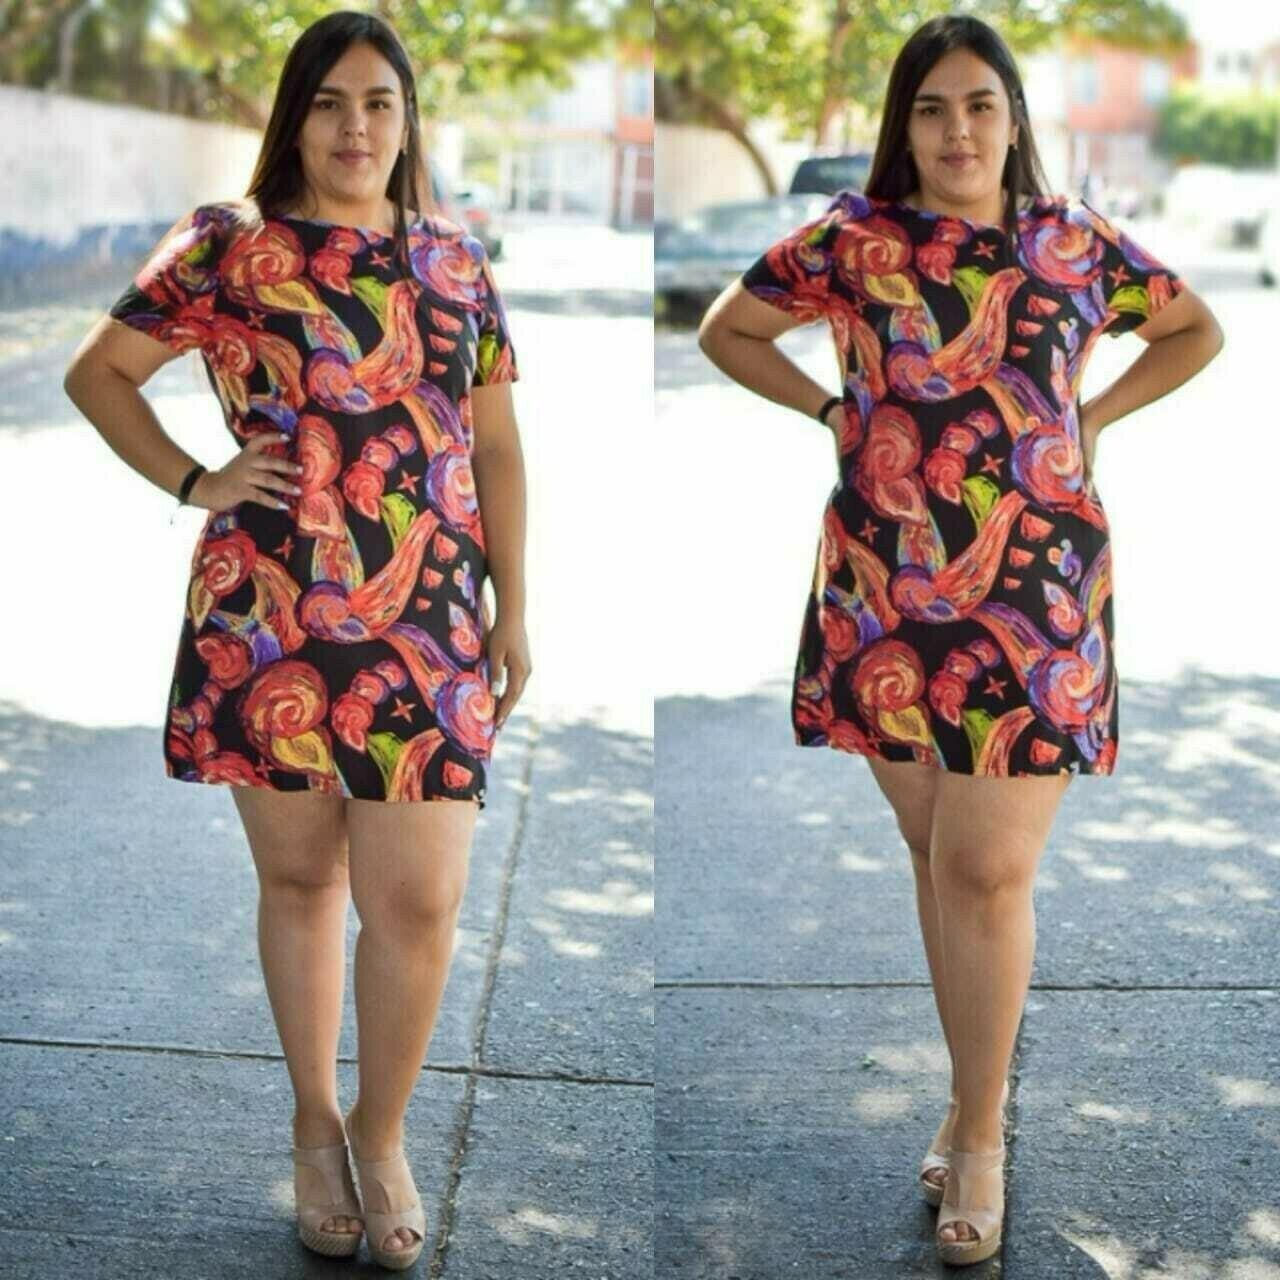 Vestido curvy floreado modelo 01349